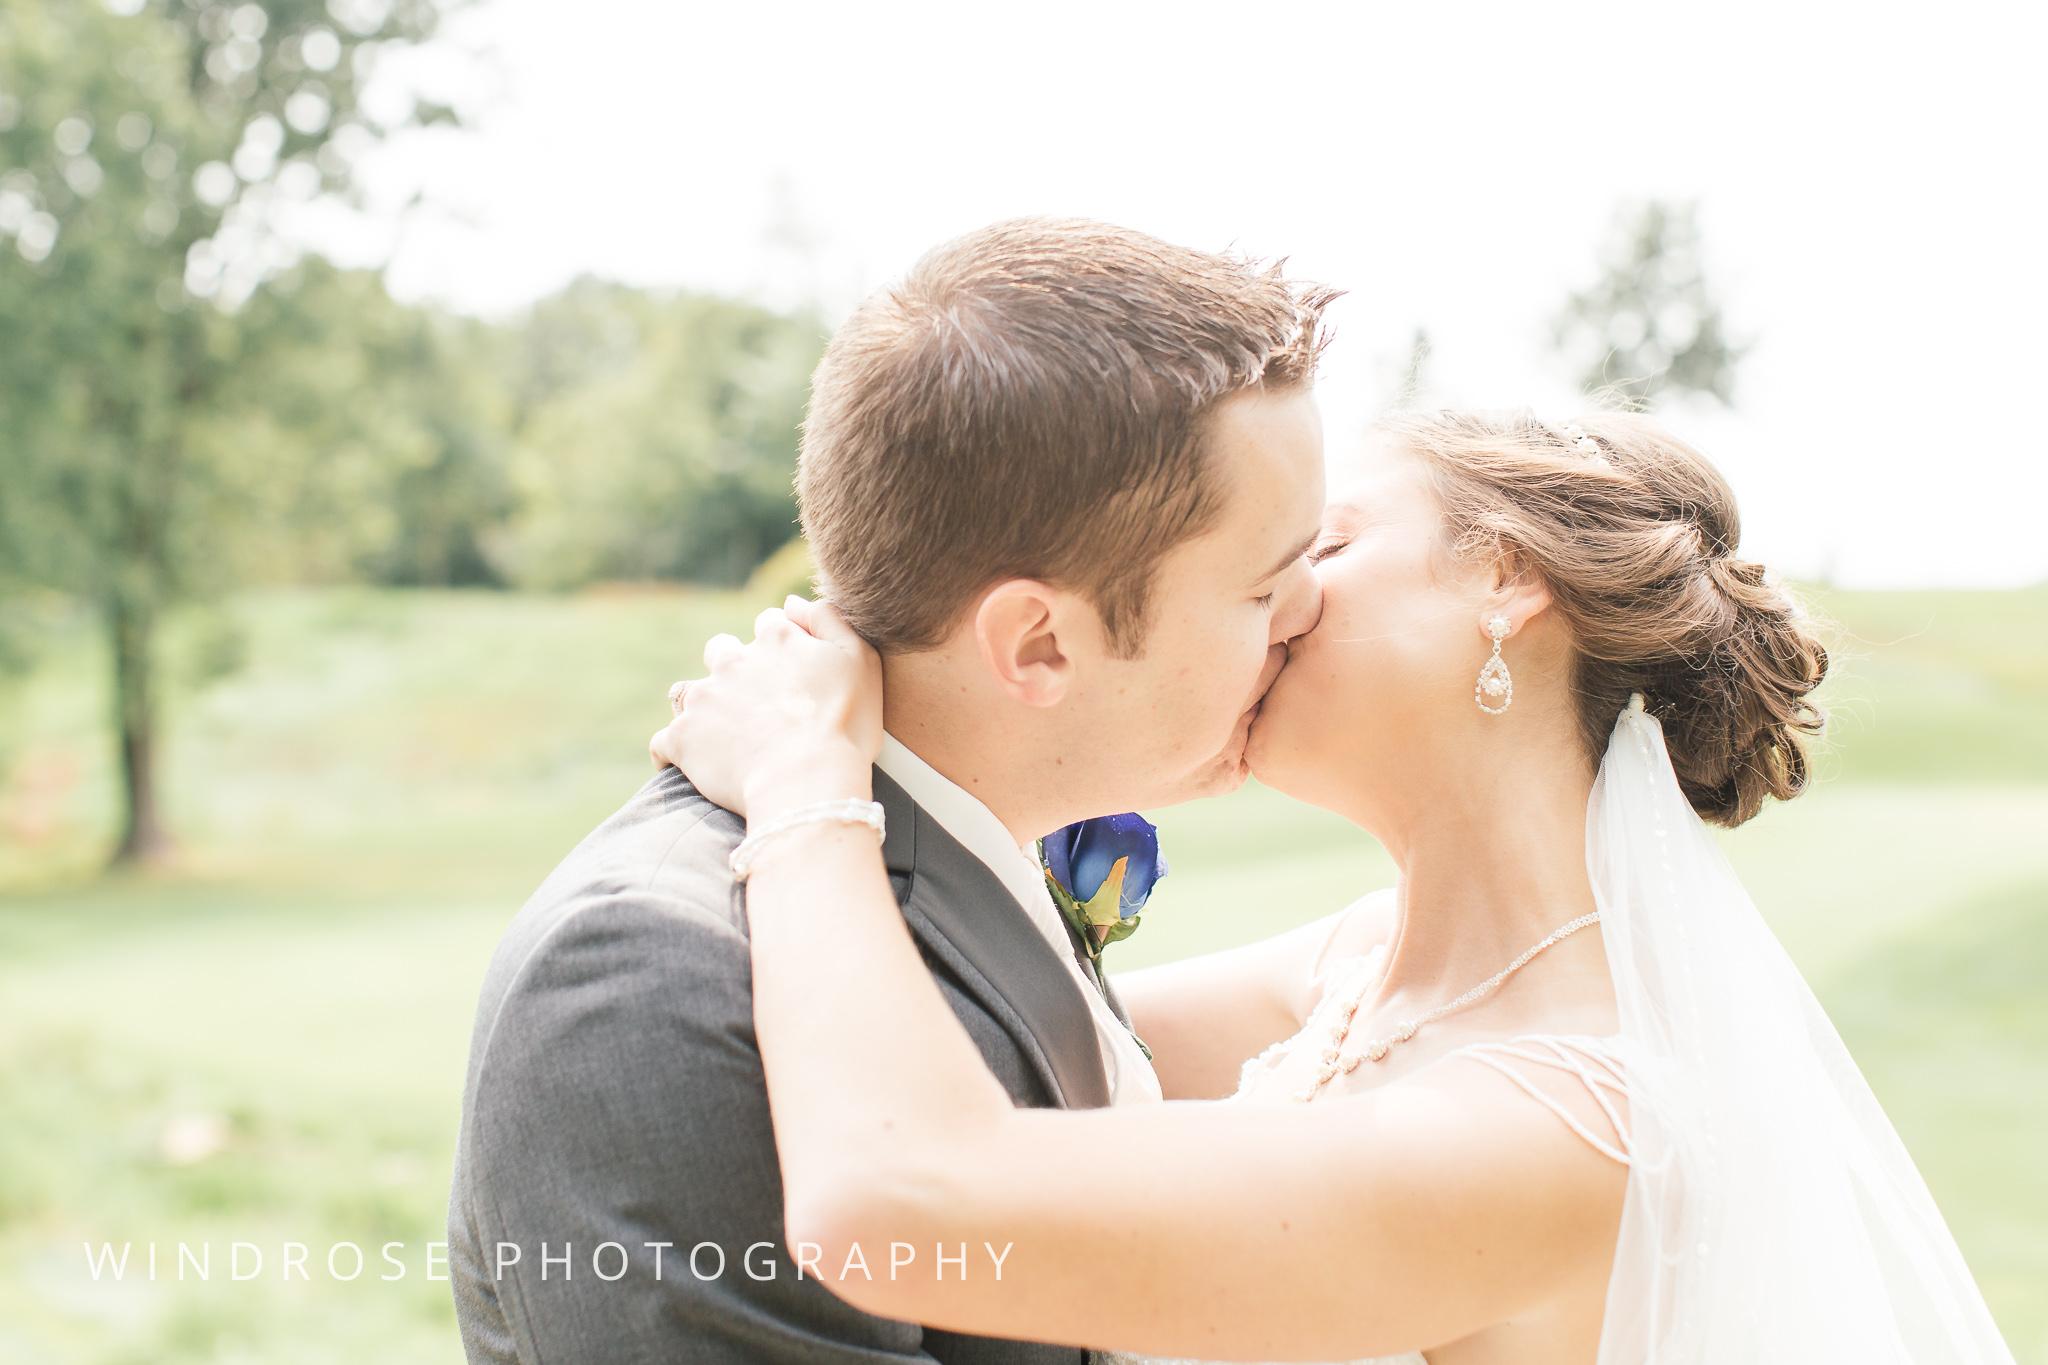 La-Crosse-Country-Club-Wedding-Minnesota-Wedding-Photographer-8.jpg